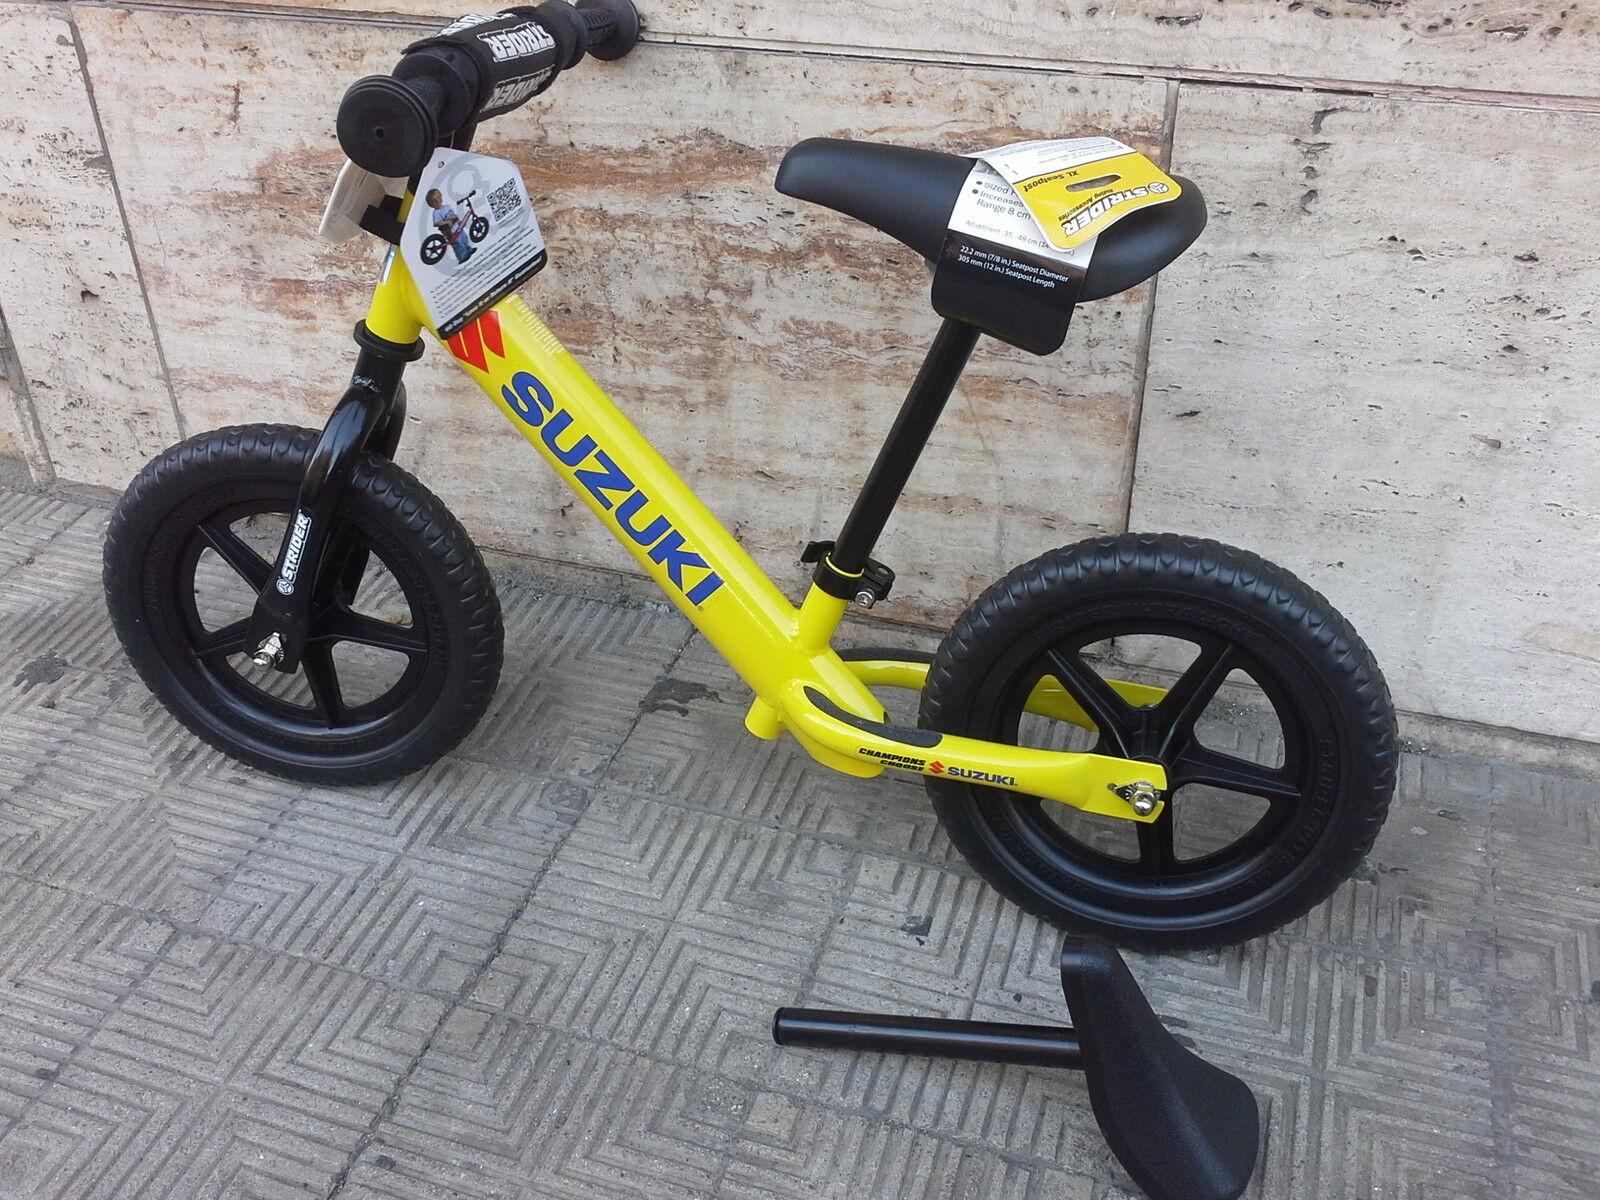 ORIGINALE SUZUKI MOTO BIMBO KIDDI BIKE 3 ANNI senza pedali -Kiddimoto-Legno